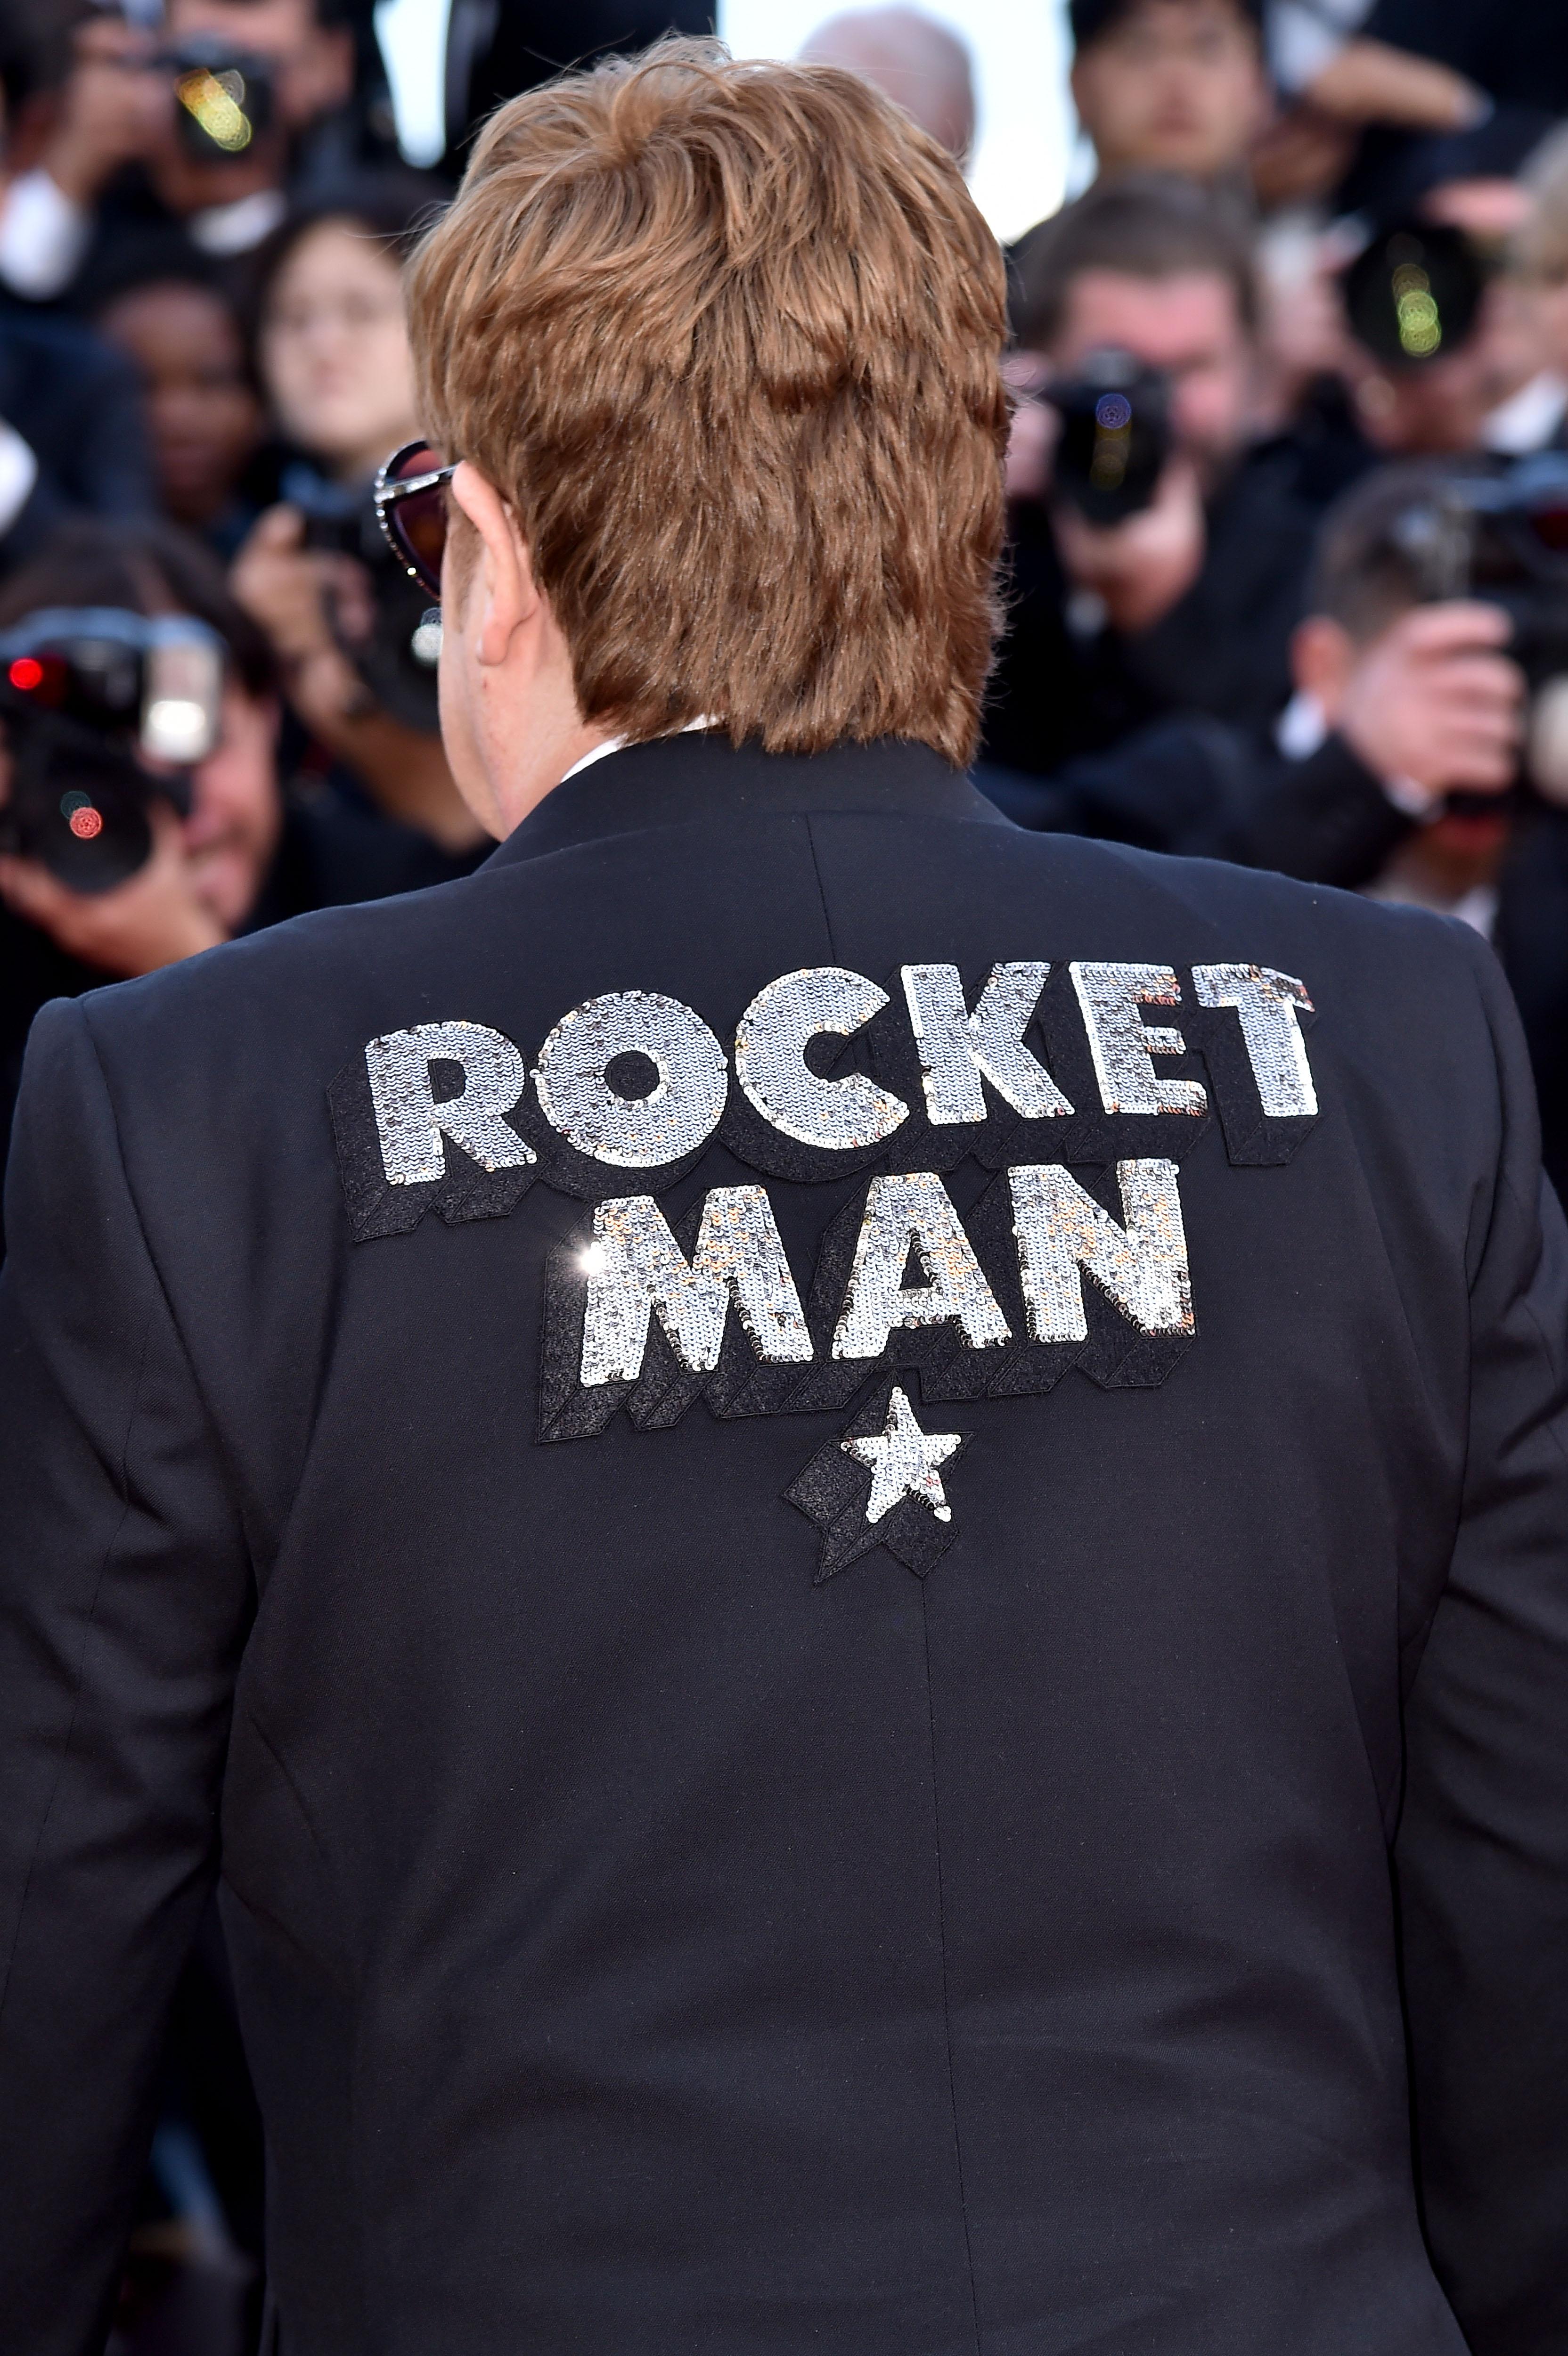 Elton John at an event for Rocketman (2019)